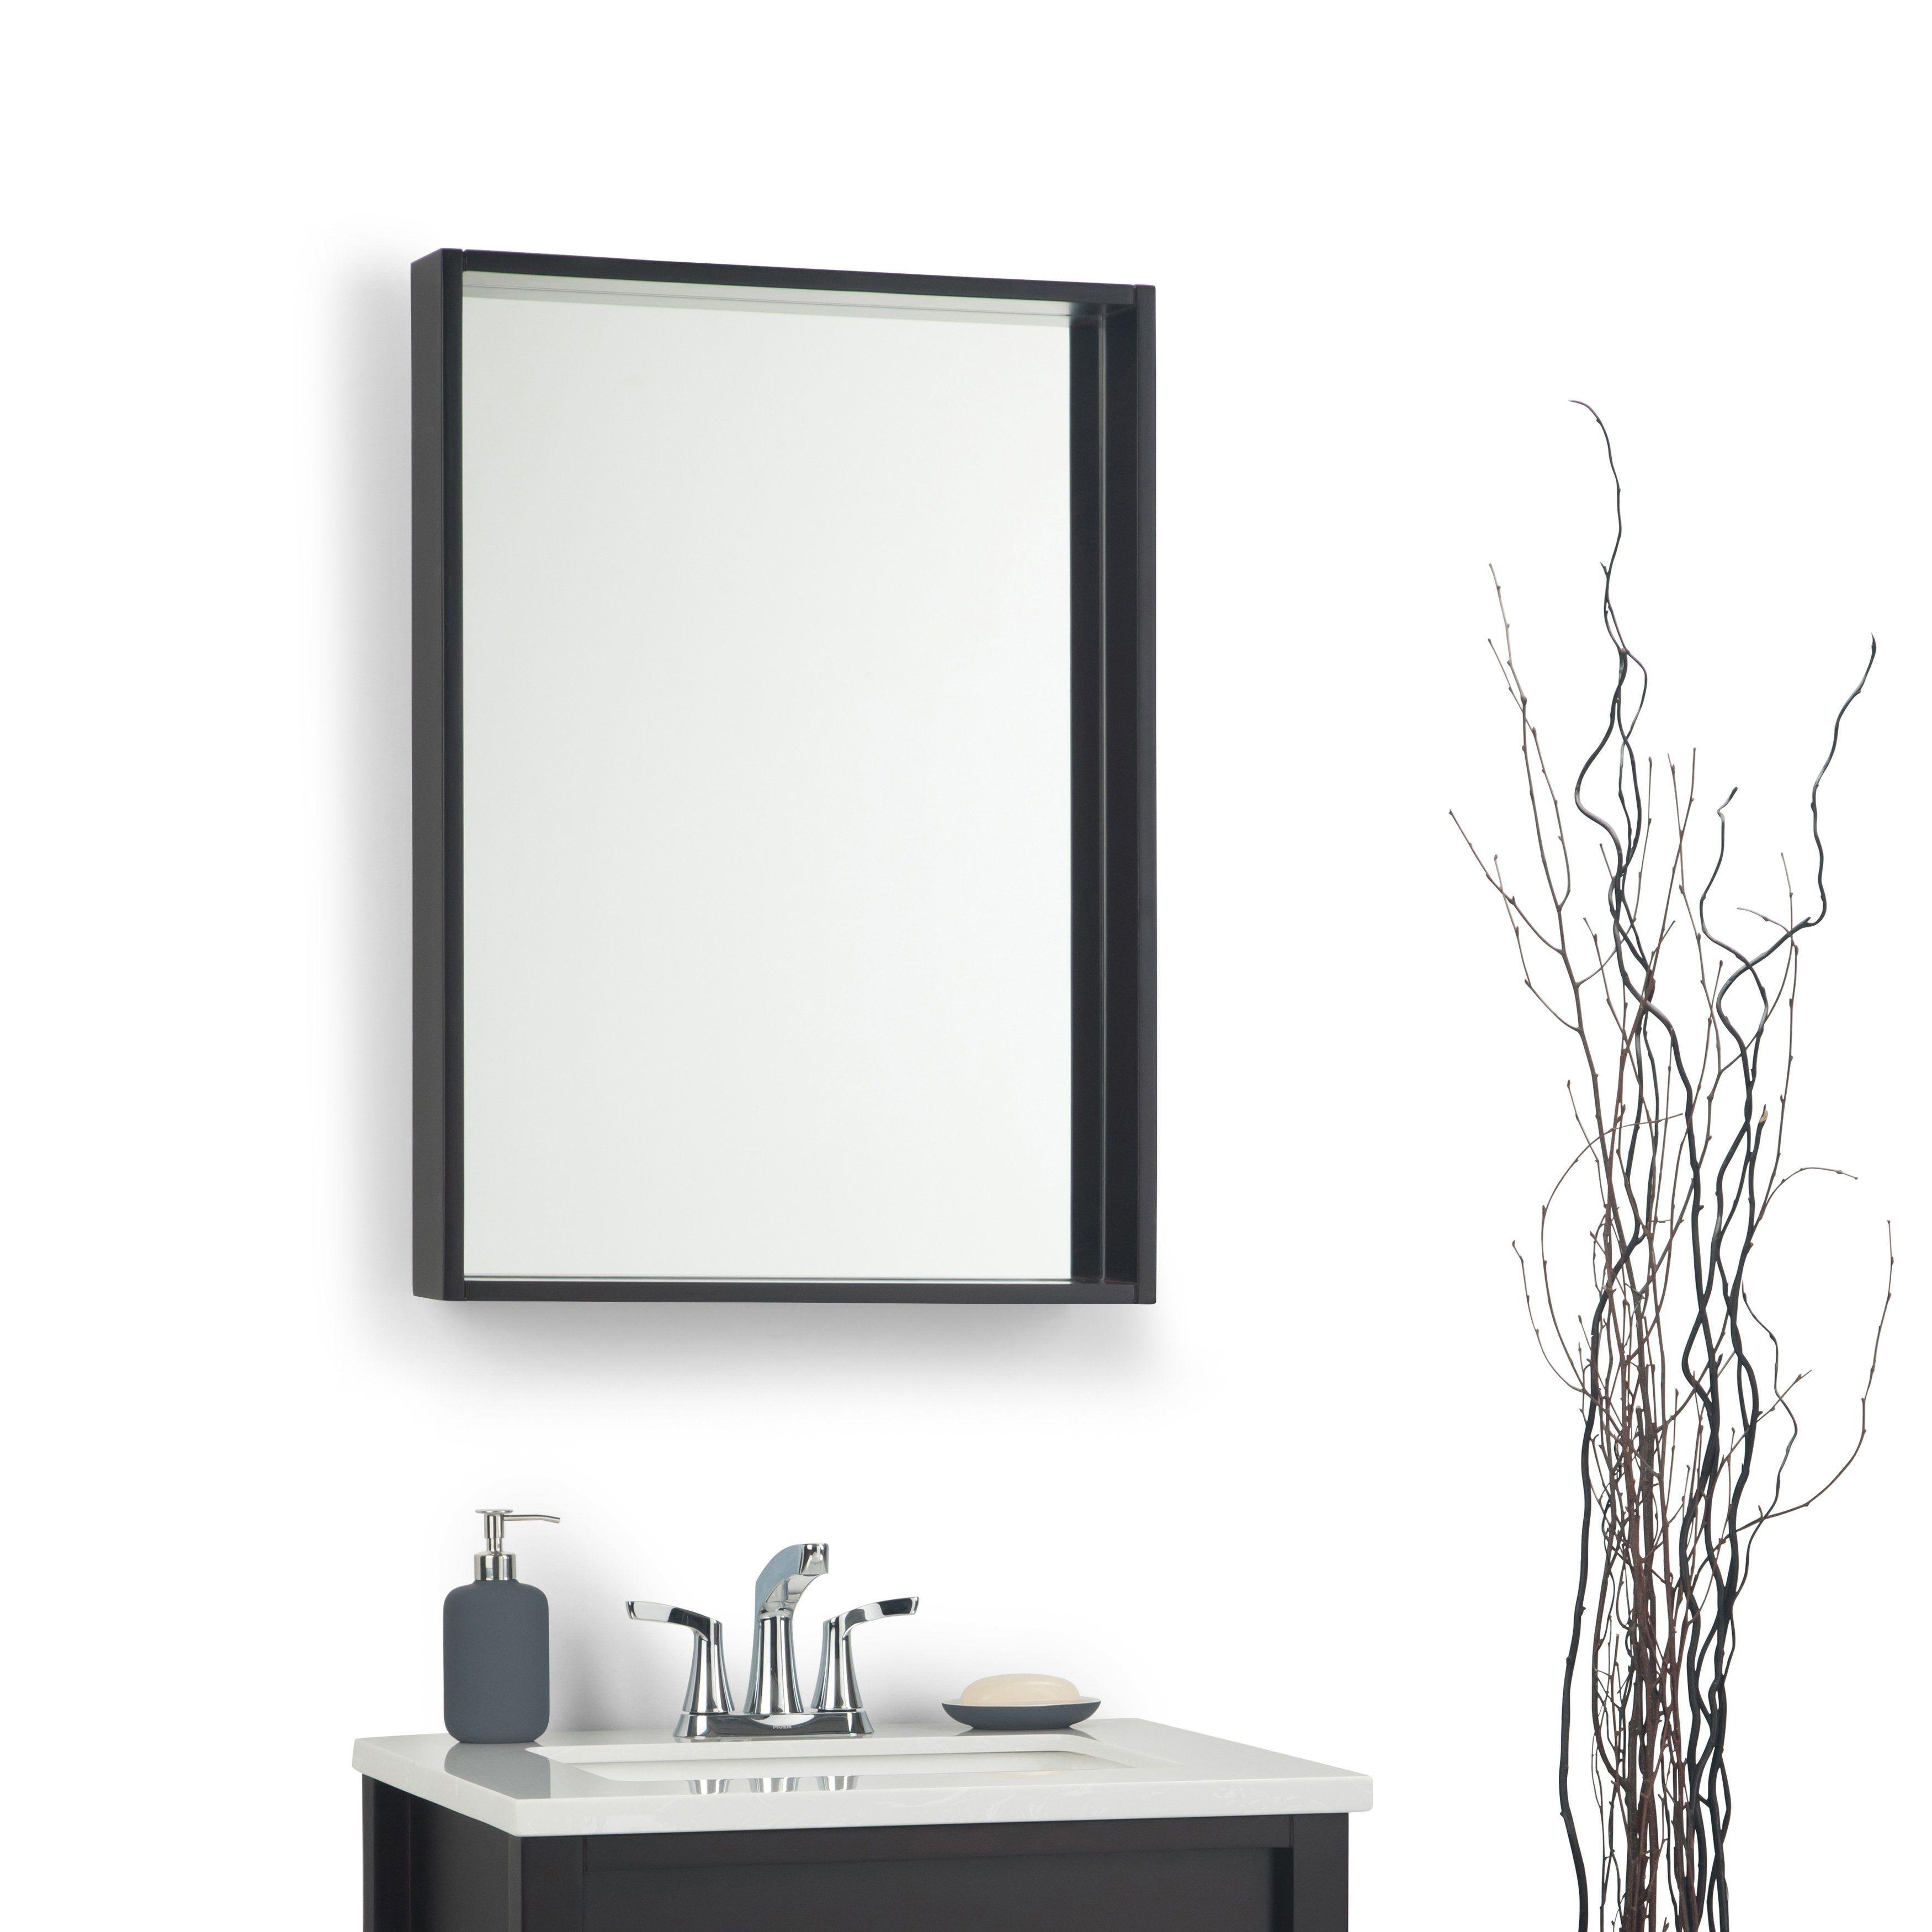 Carbon Loft Mel Modern Box Frame Mirror Bathroom Vanity Dark Walnut Modern Contemporary Dark Brown Bathroom Vanity Mirror Mirror Wall Mounted Mirror